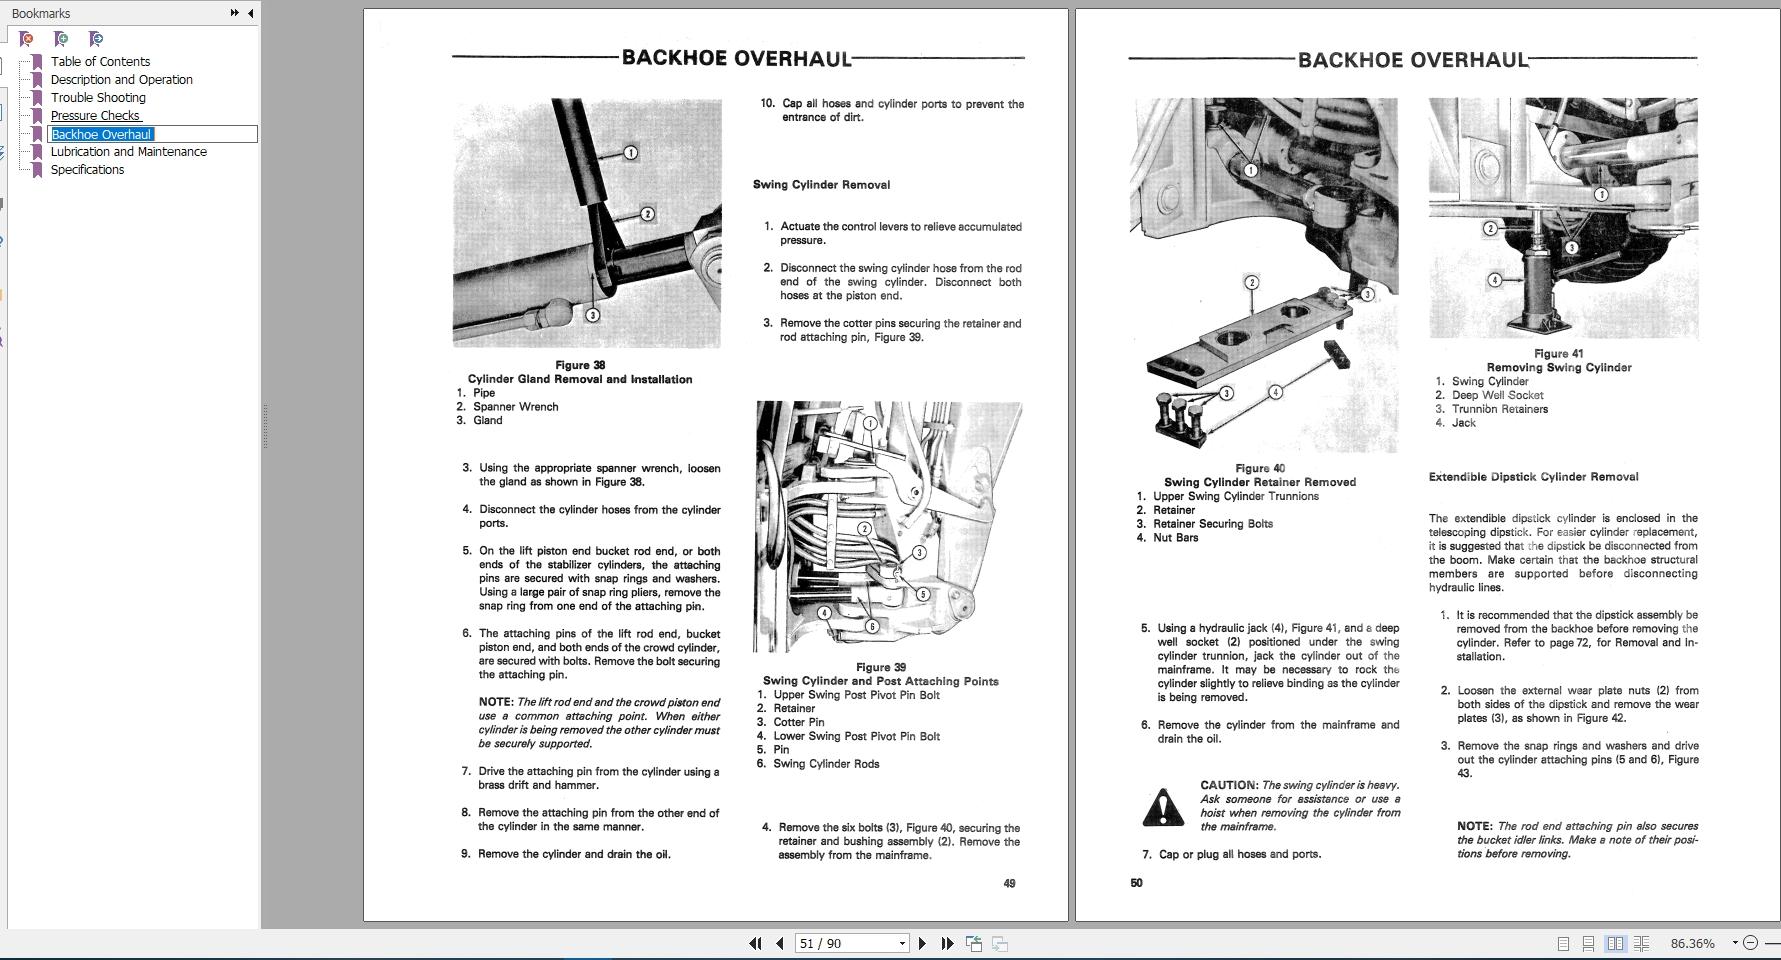 New Holland Backhoe Series 765 Repair Manual 40076510